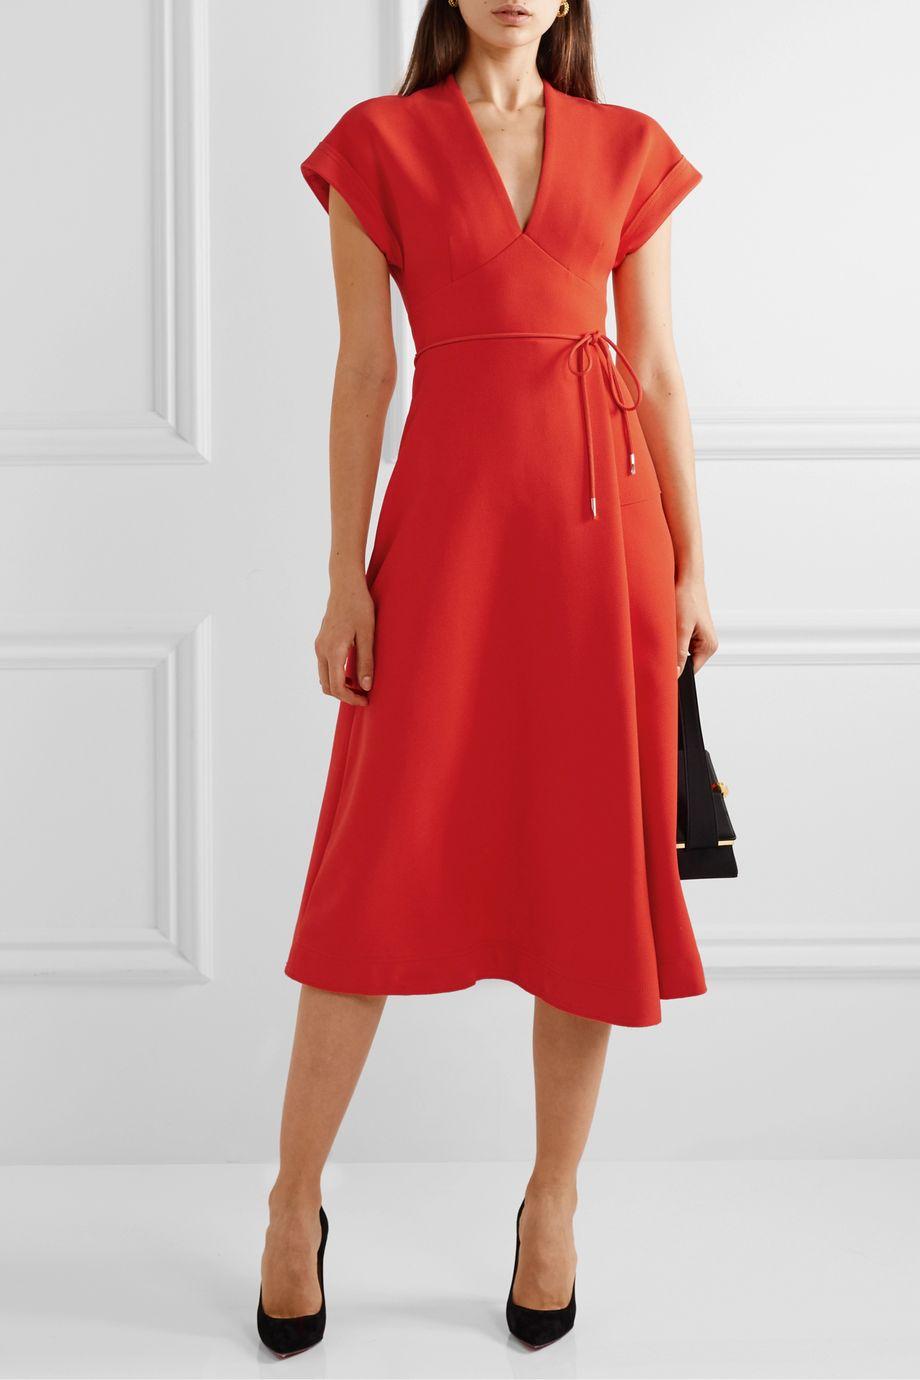 Rebecca Vallance Galerie cloqué midi dress